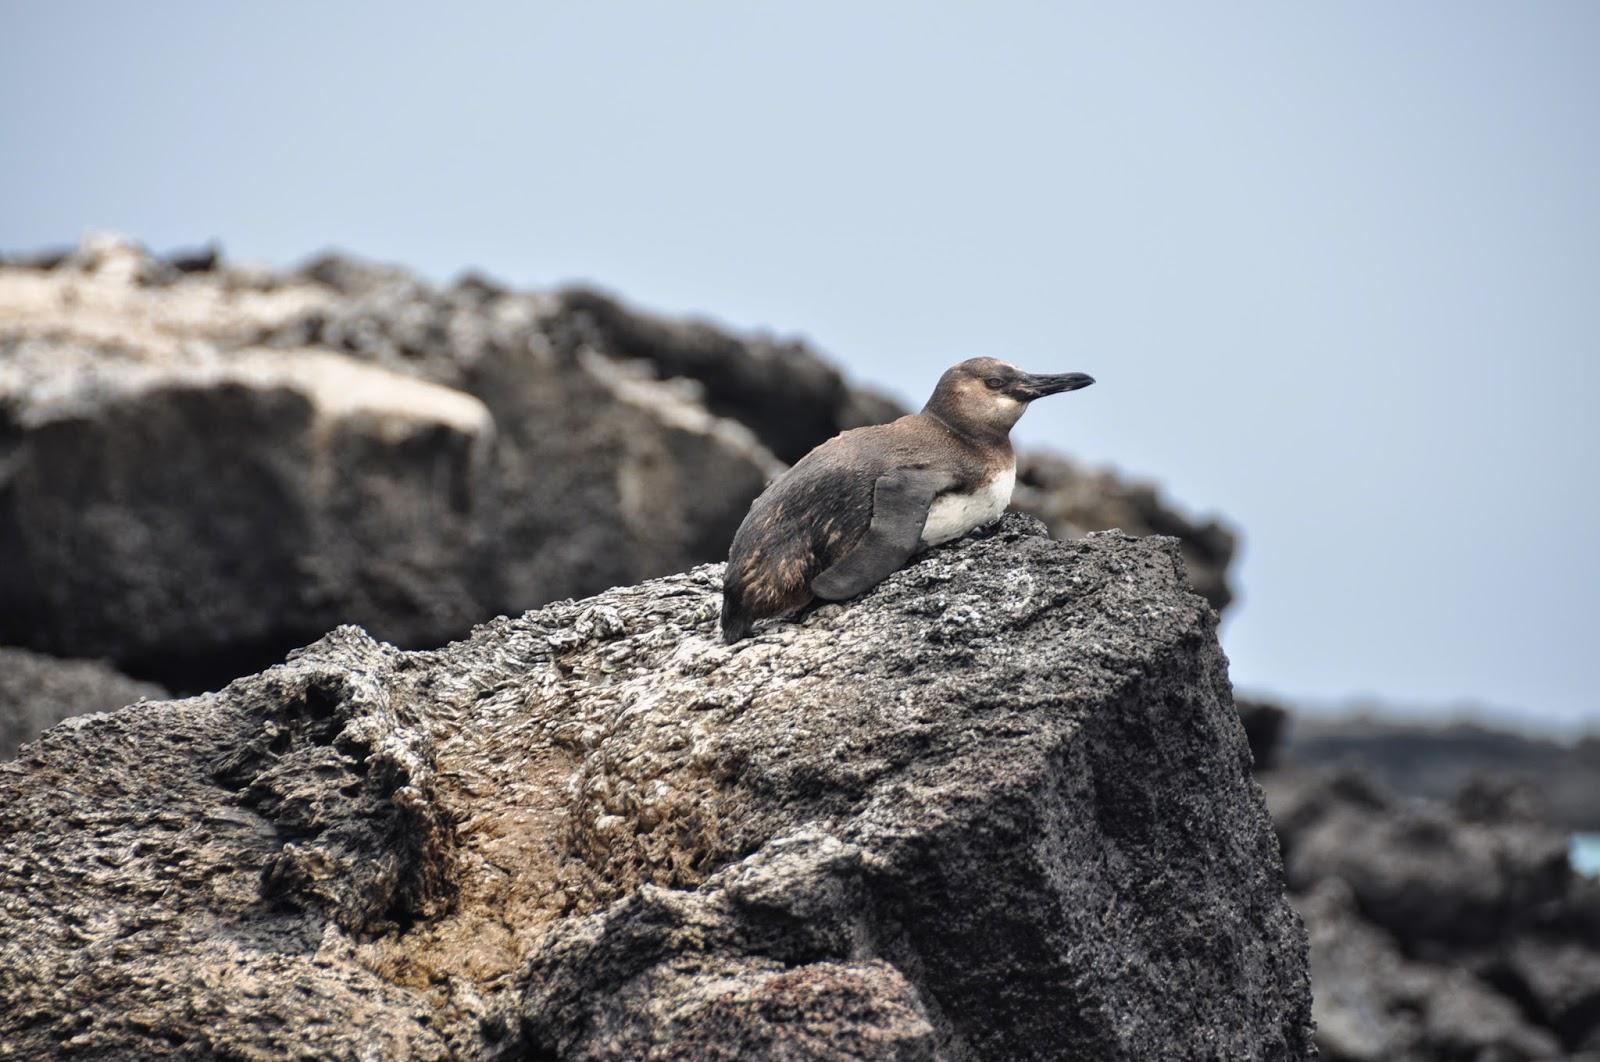 A Galapagos penguin!